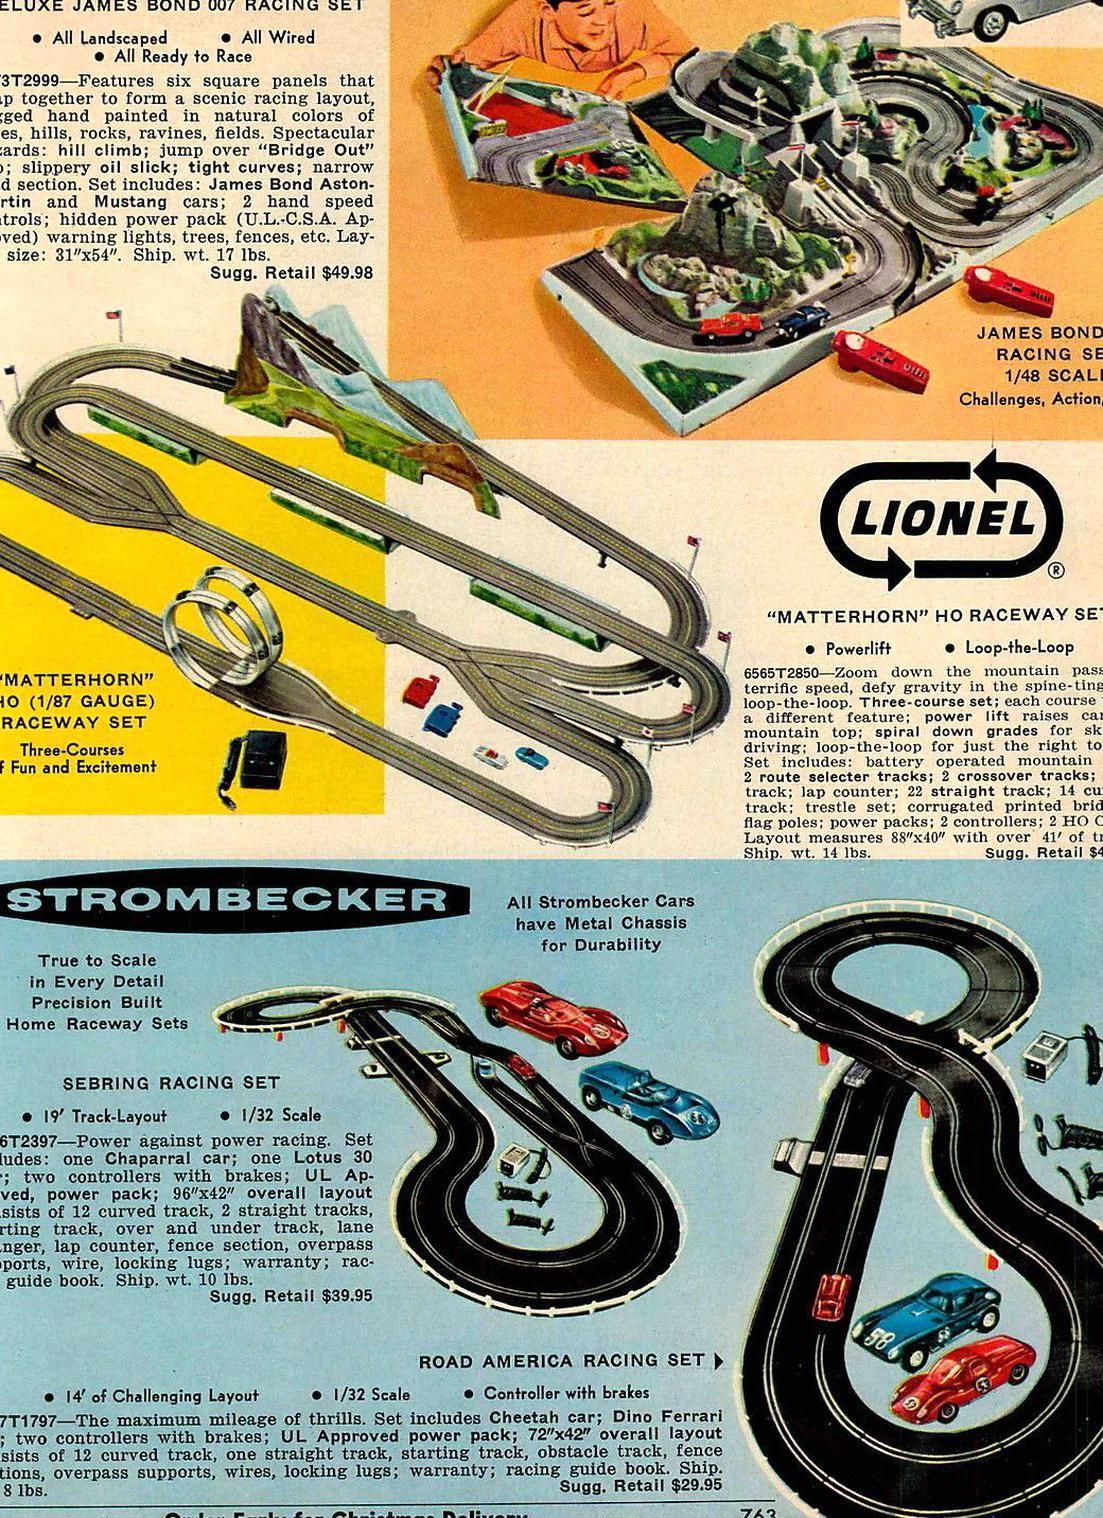 1967 Advert Gilbert James Bond 007 Lionel Strombecker Race Car Raceway Toy Sets Ebay James Bond Slot Cars Strombecker